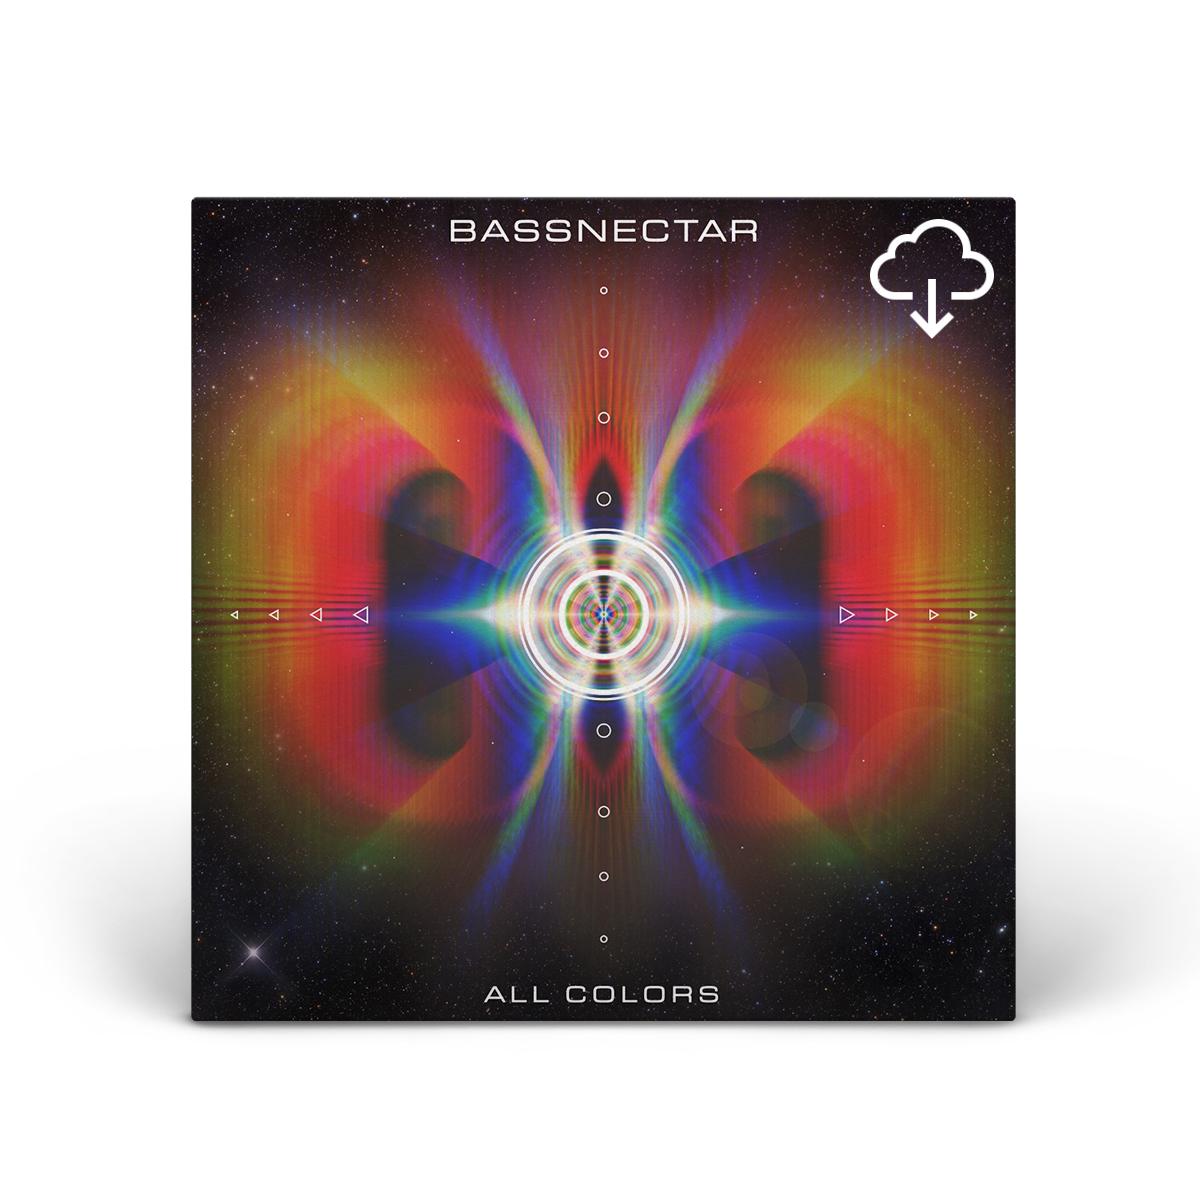 All Colors single: Uebok Gotta Run - Apashe & Instasamka (Bassnectar Remix)